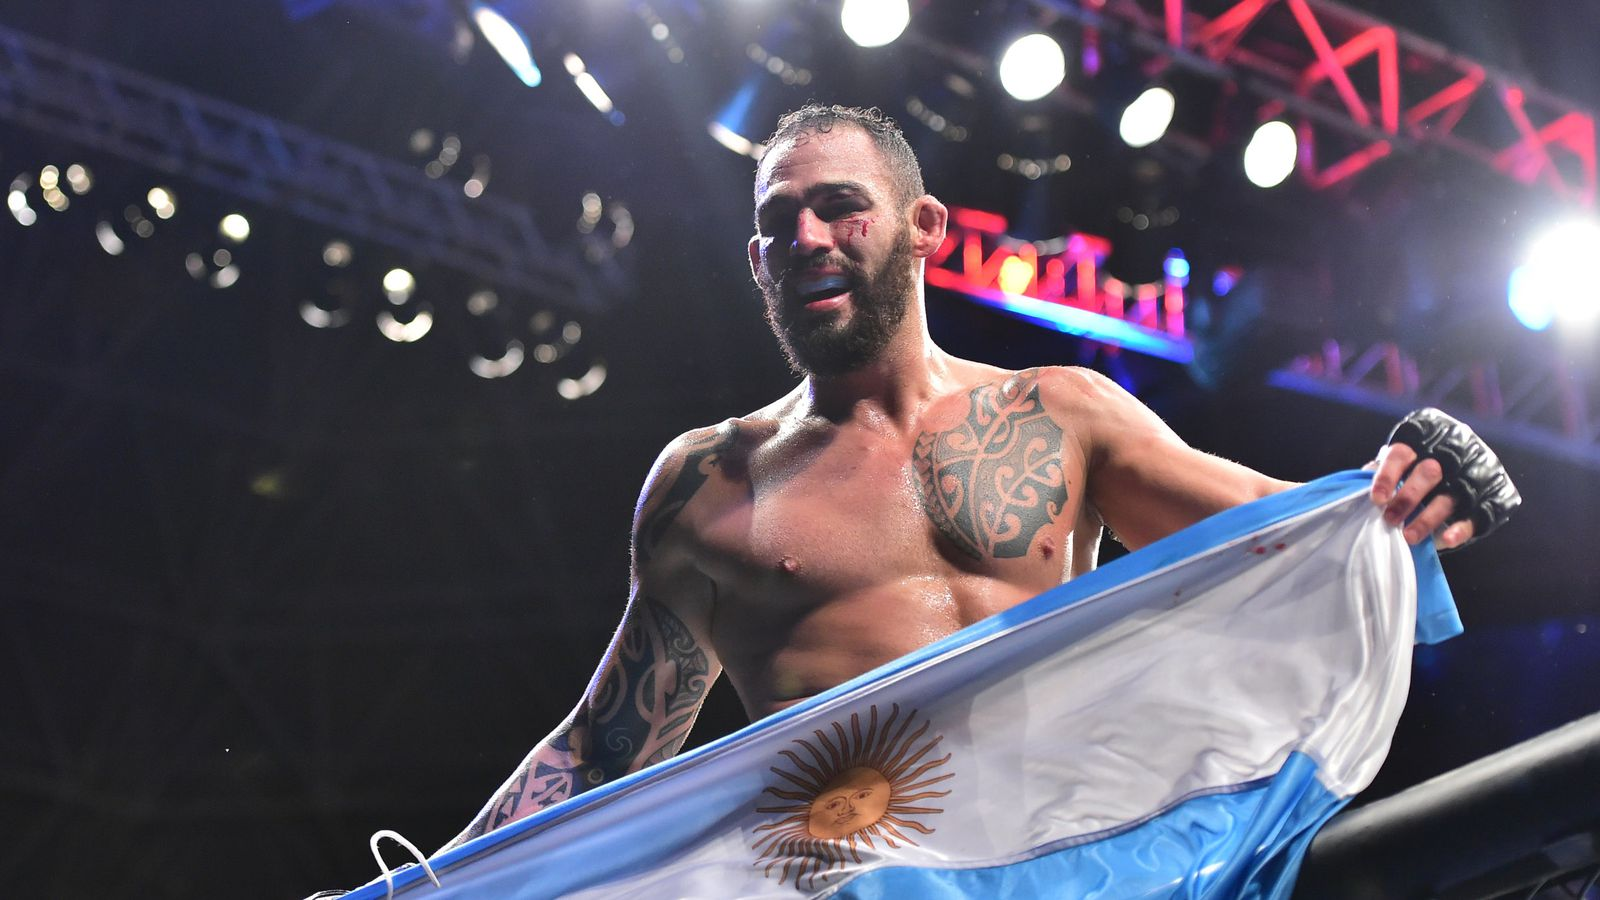 Santiago Ponzinibbio not interested in 'unprofessional' Darren Till, prefers winner of Dos Anjos-Usman